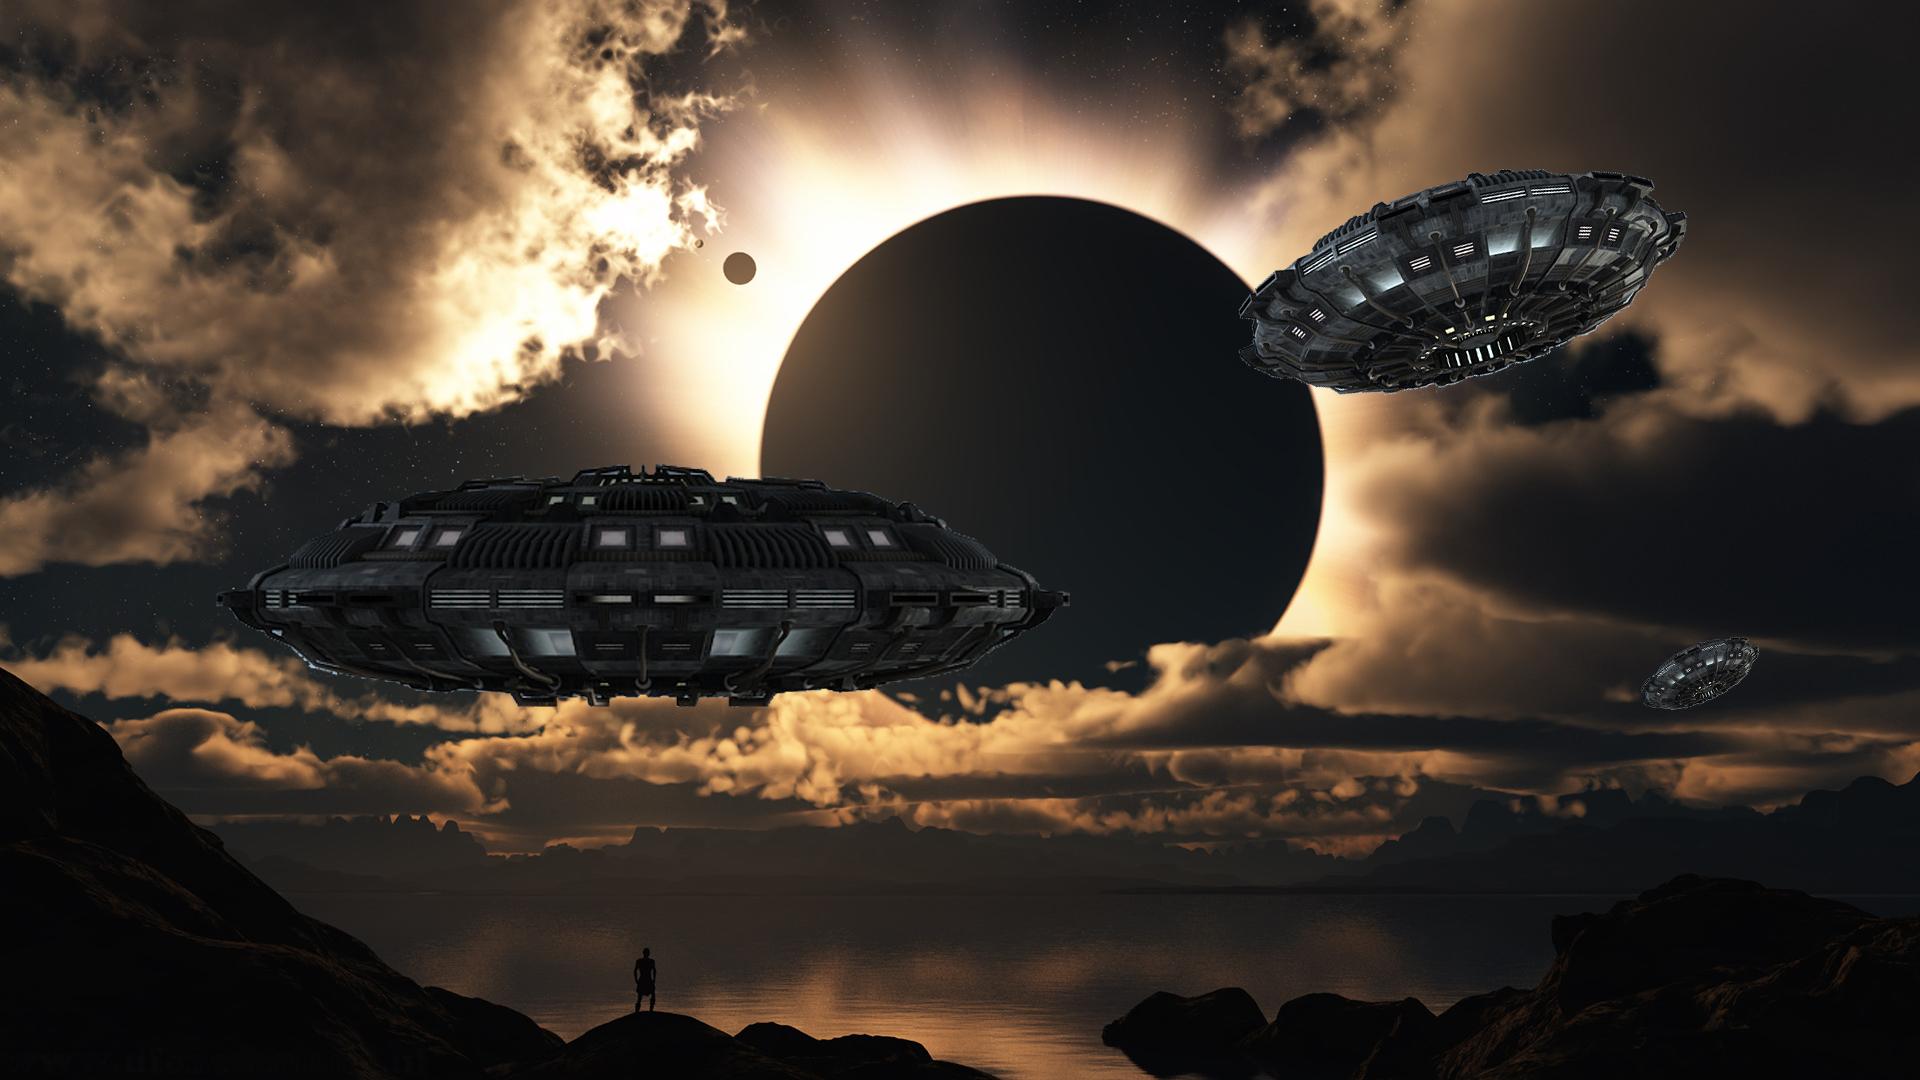 UFOnederland Full HD UFO Wallpaper Space earth ufo hd   UFONEDERLAND 1920x1080